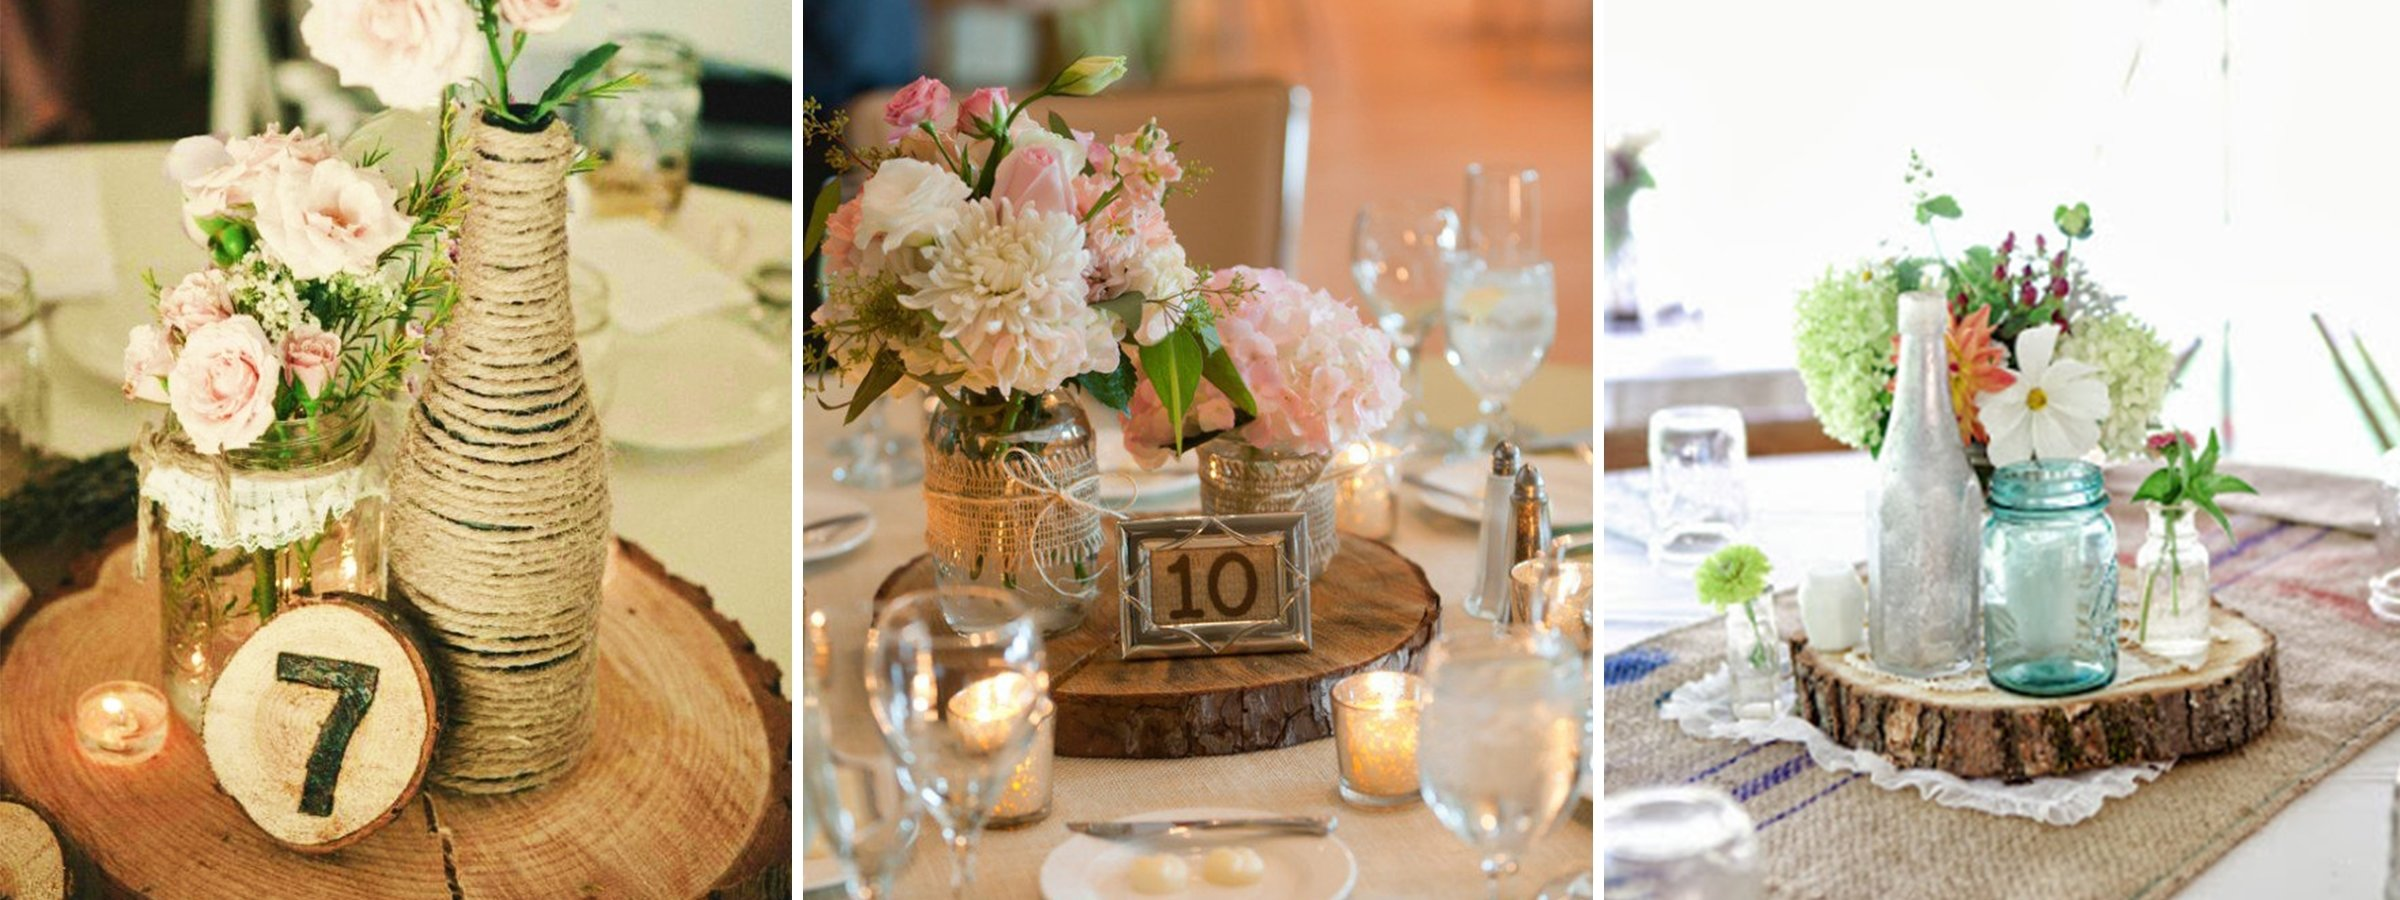 diy wedding decor ideas pinterest - gpfarmasi #4962040a02e6